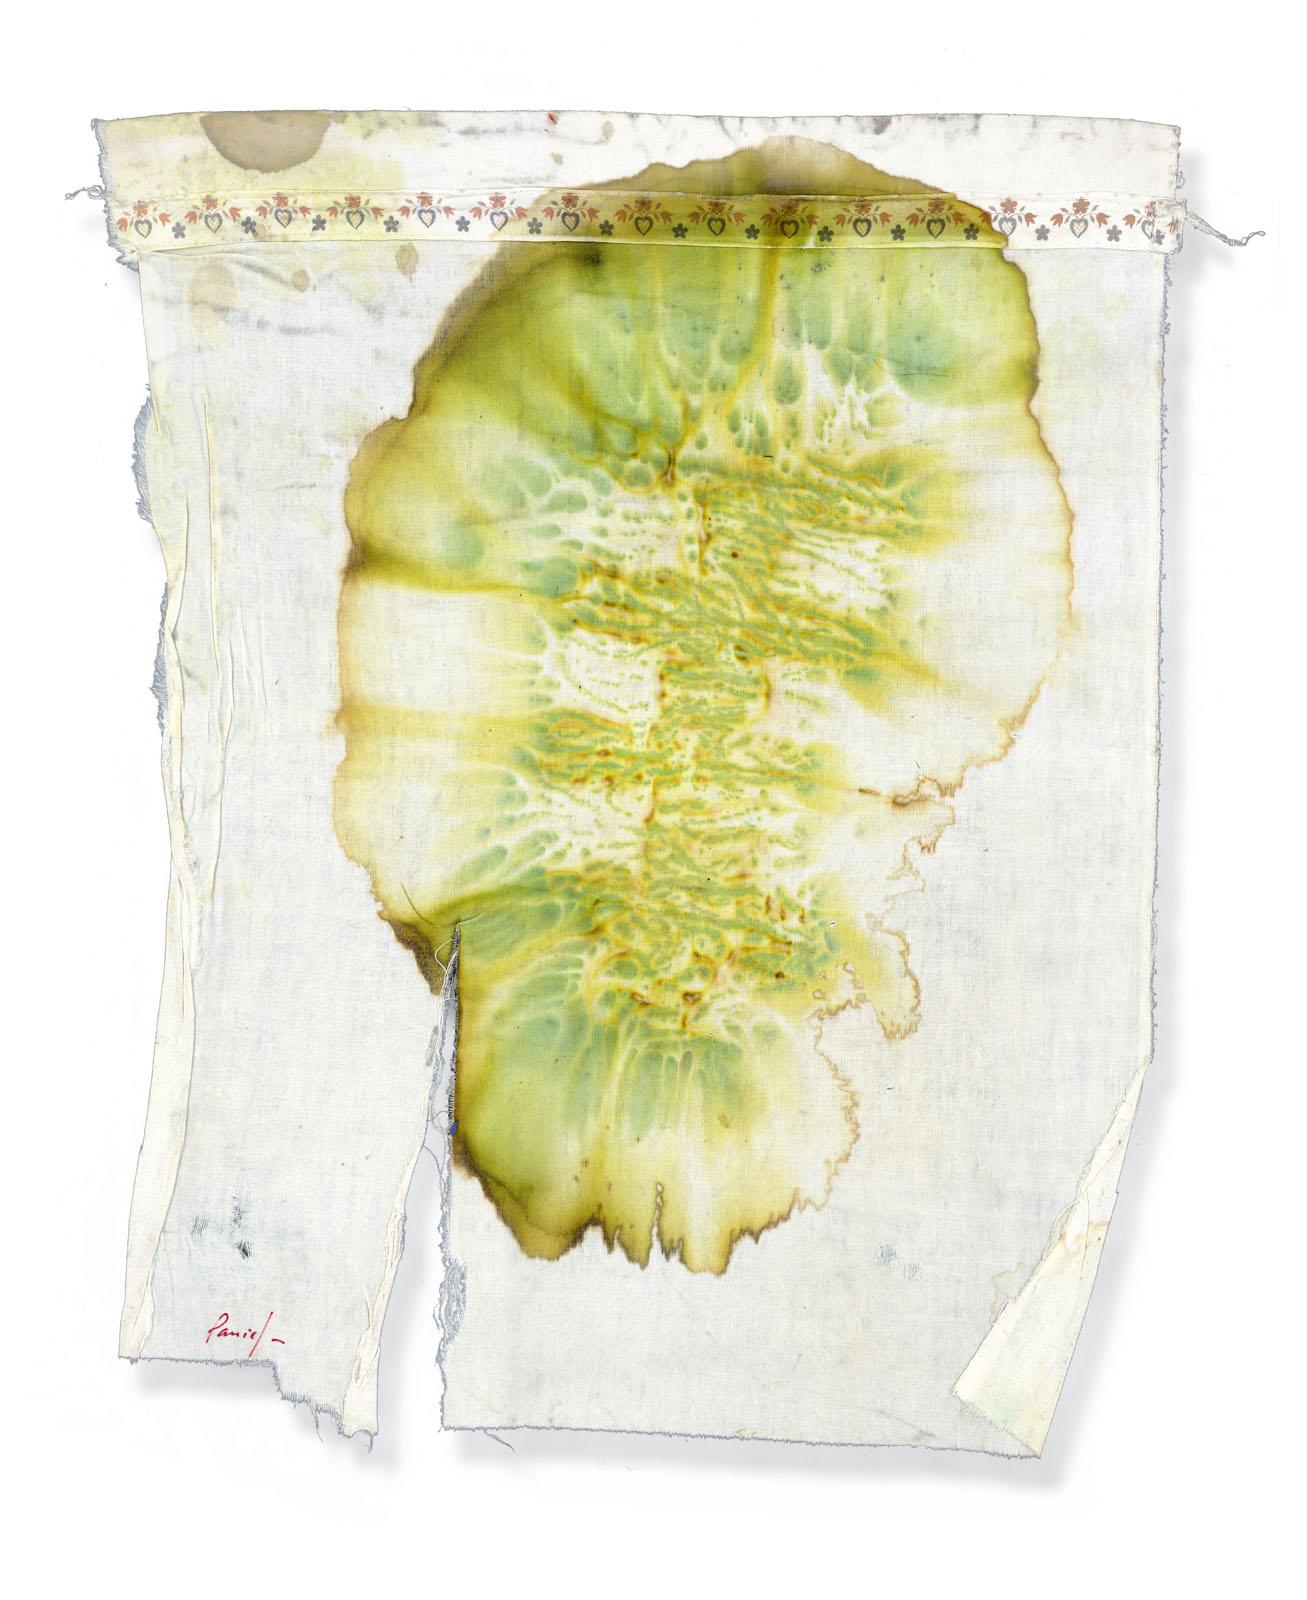 panies-danielvillalobos-spanish-painting-abstractexpressionism-23